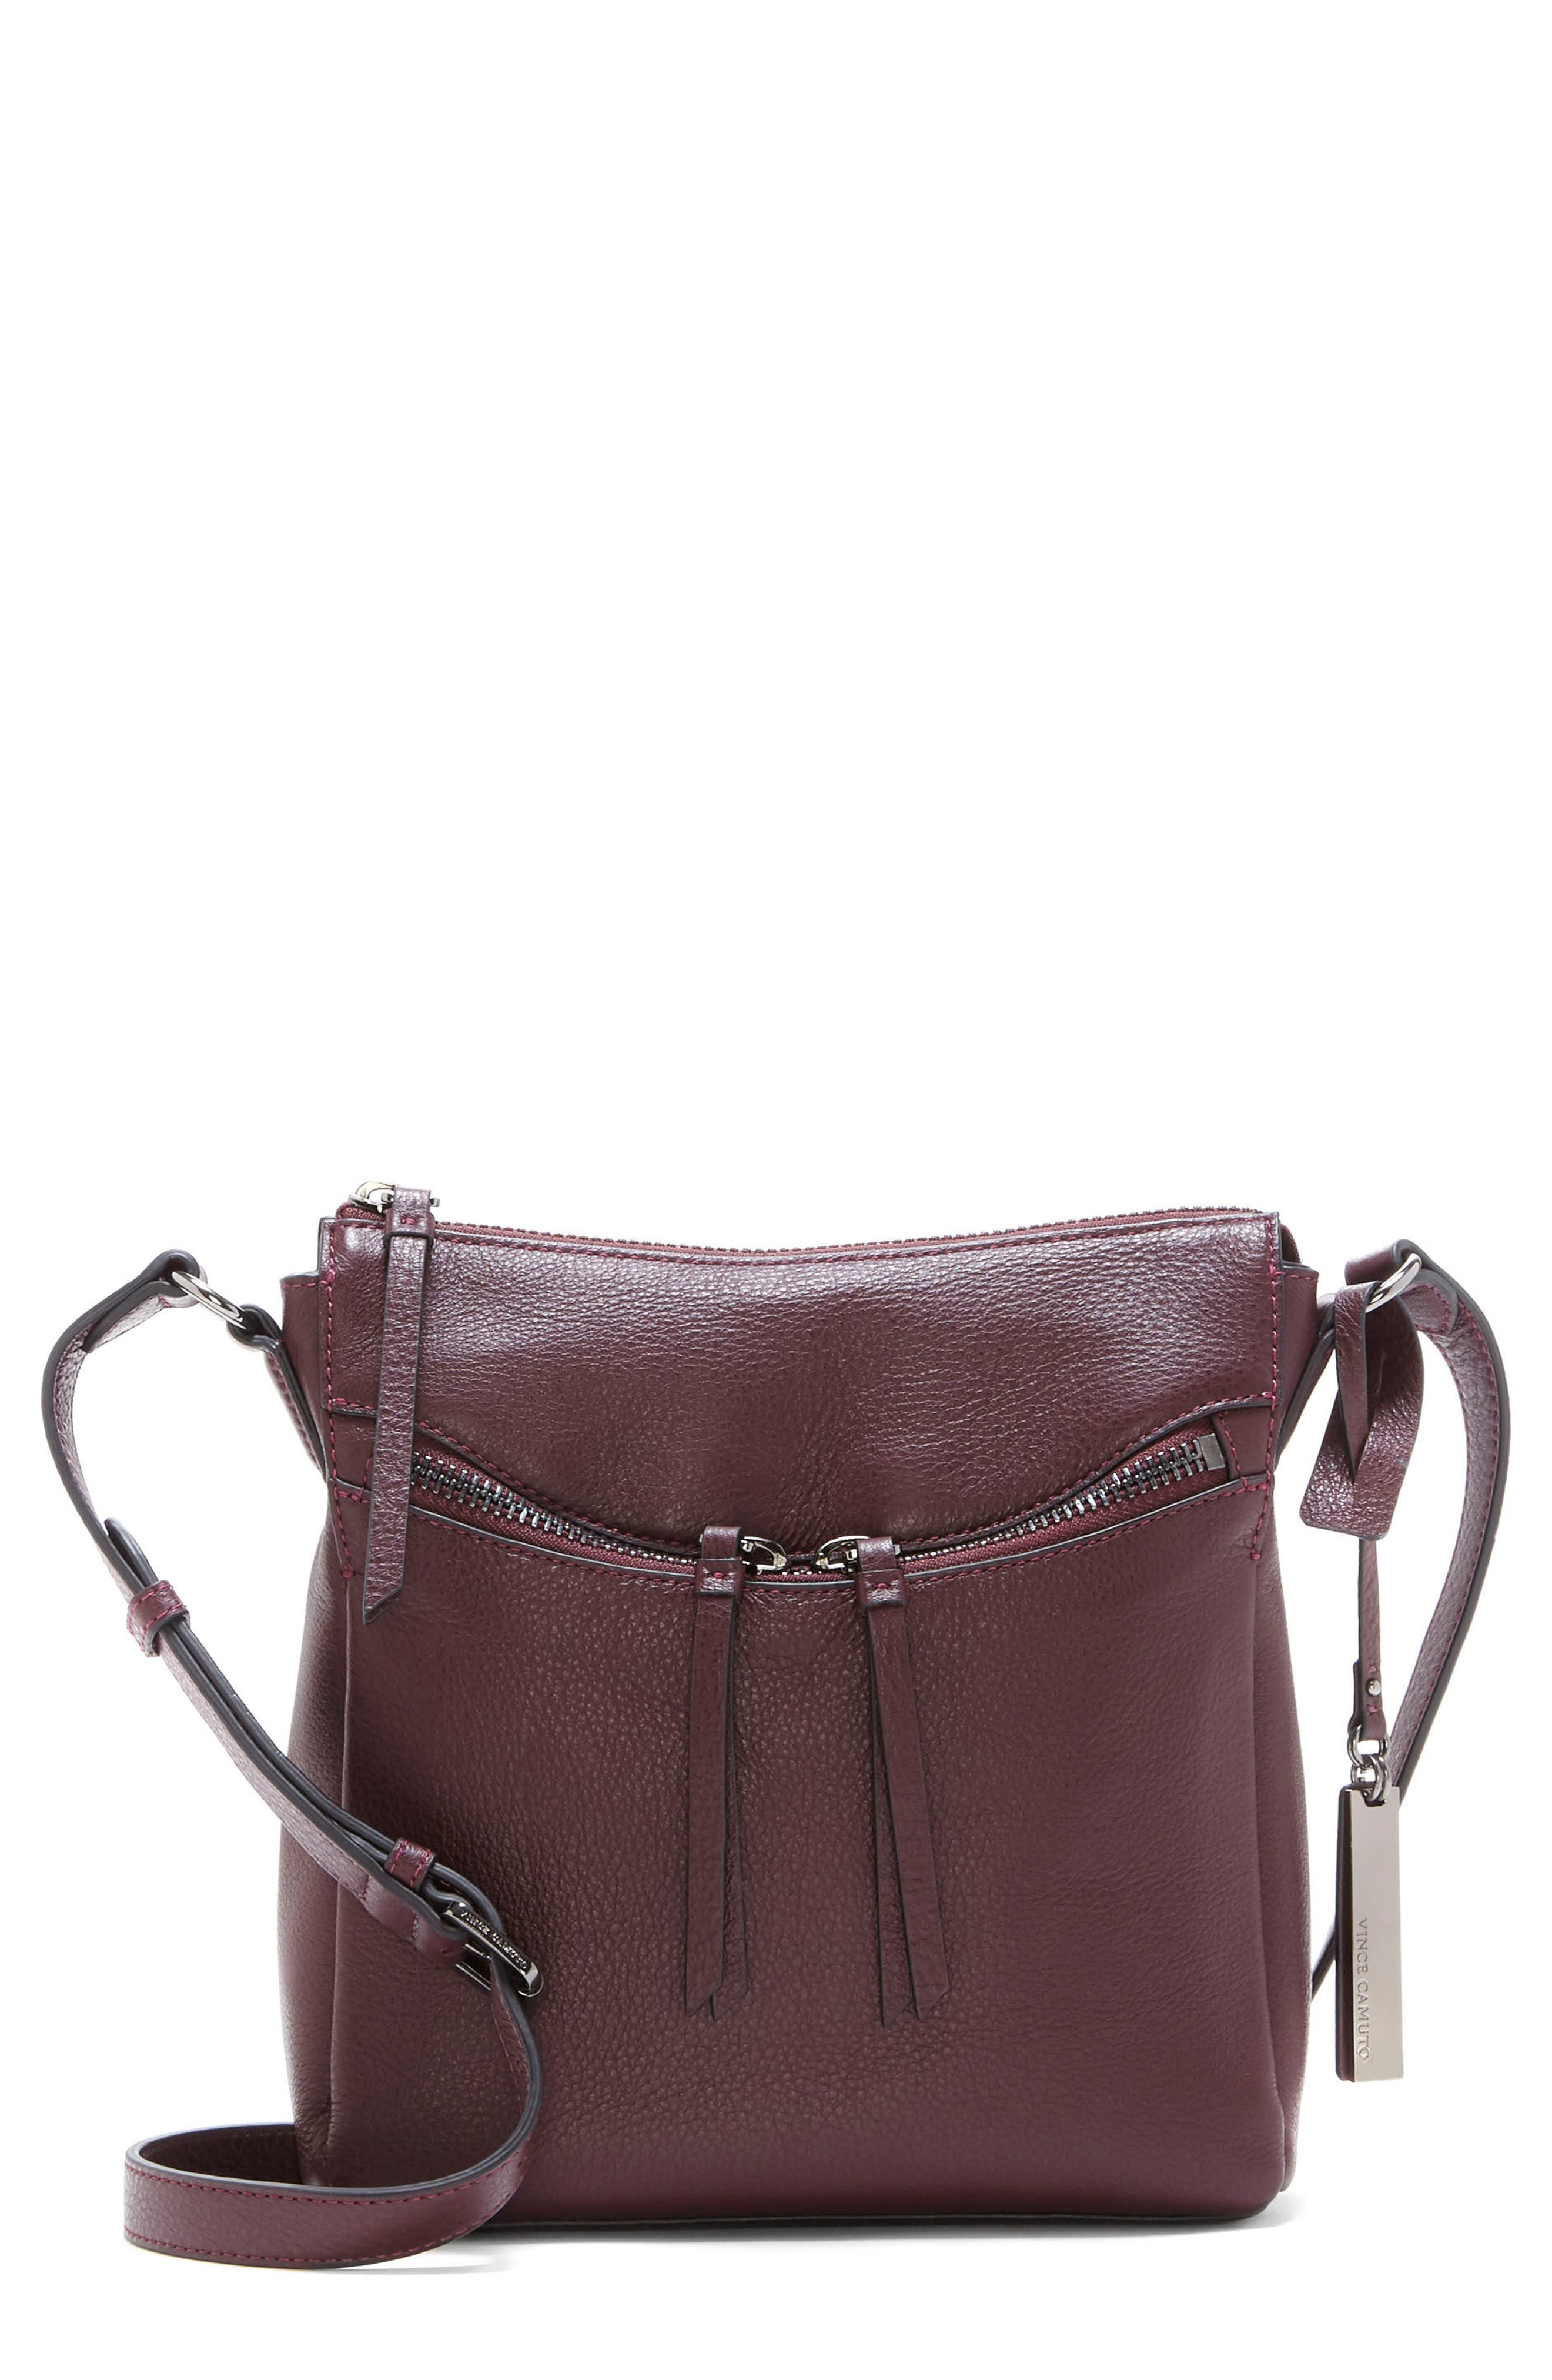 Vince Camuto Staja Leather Crossbody Bag